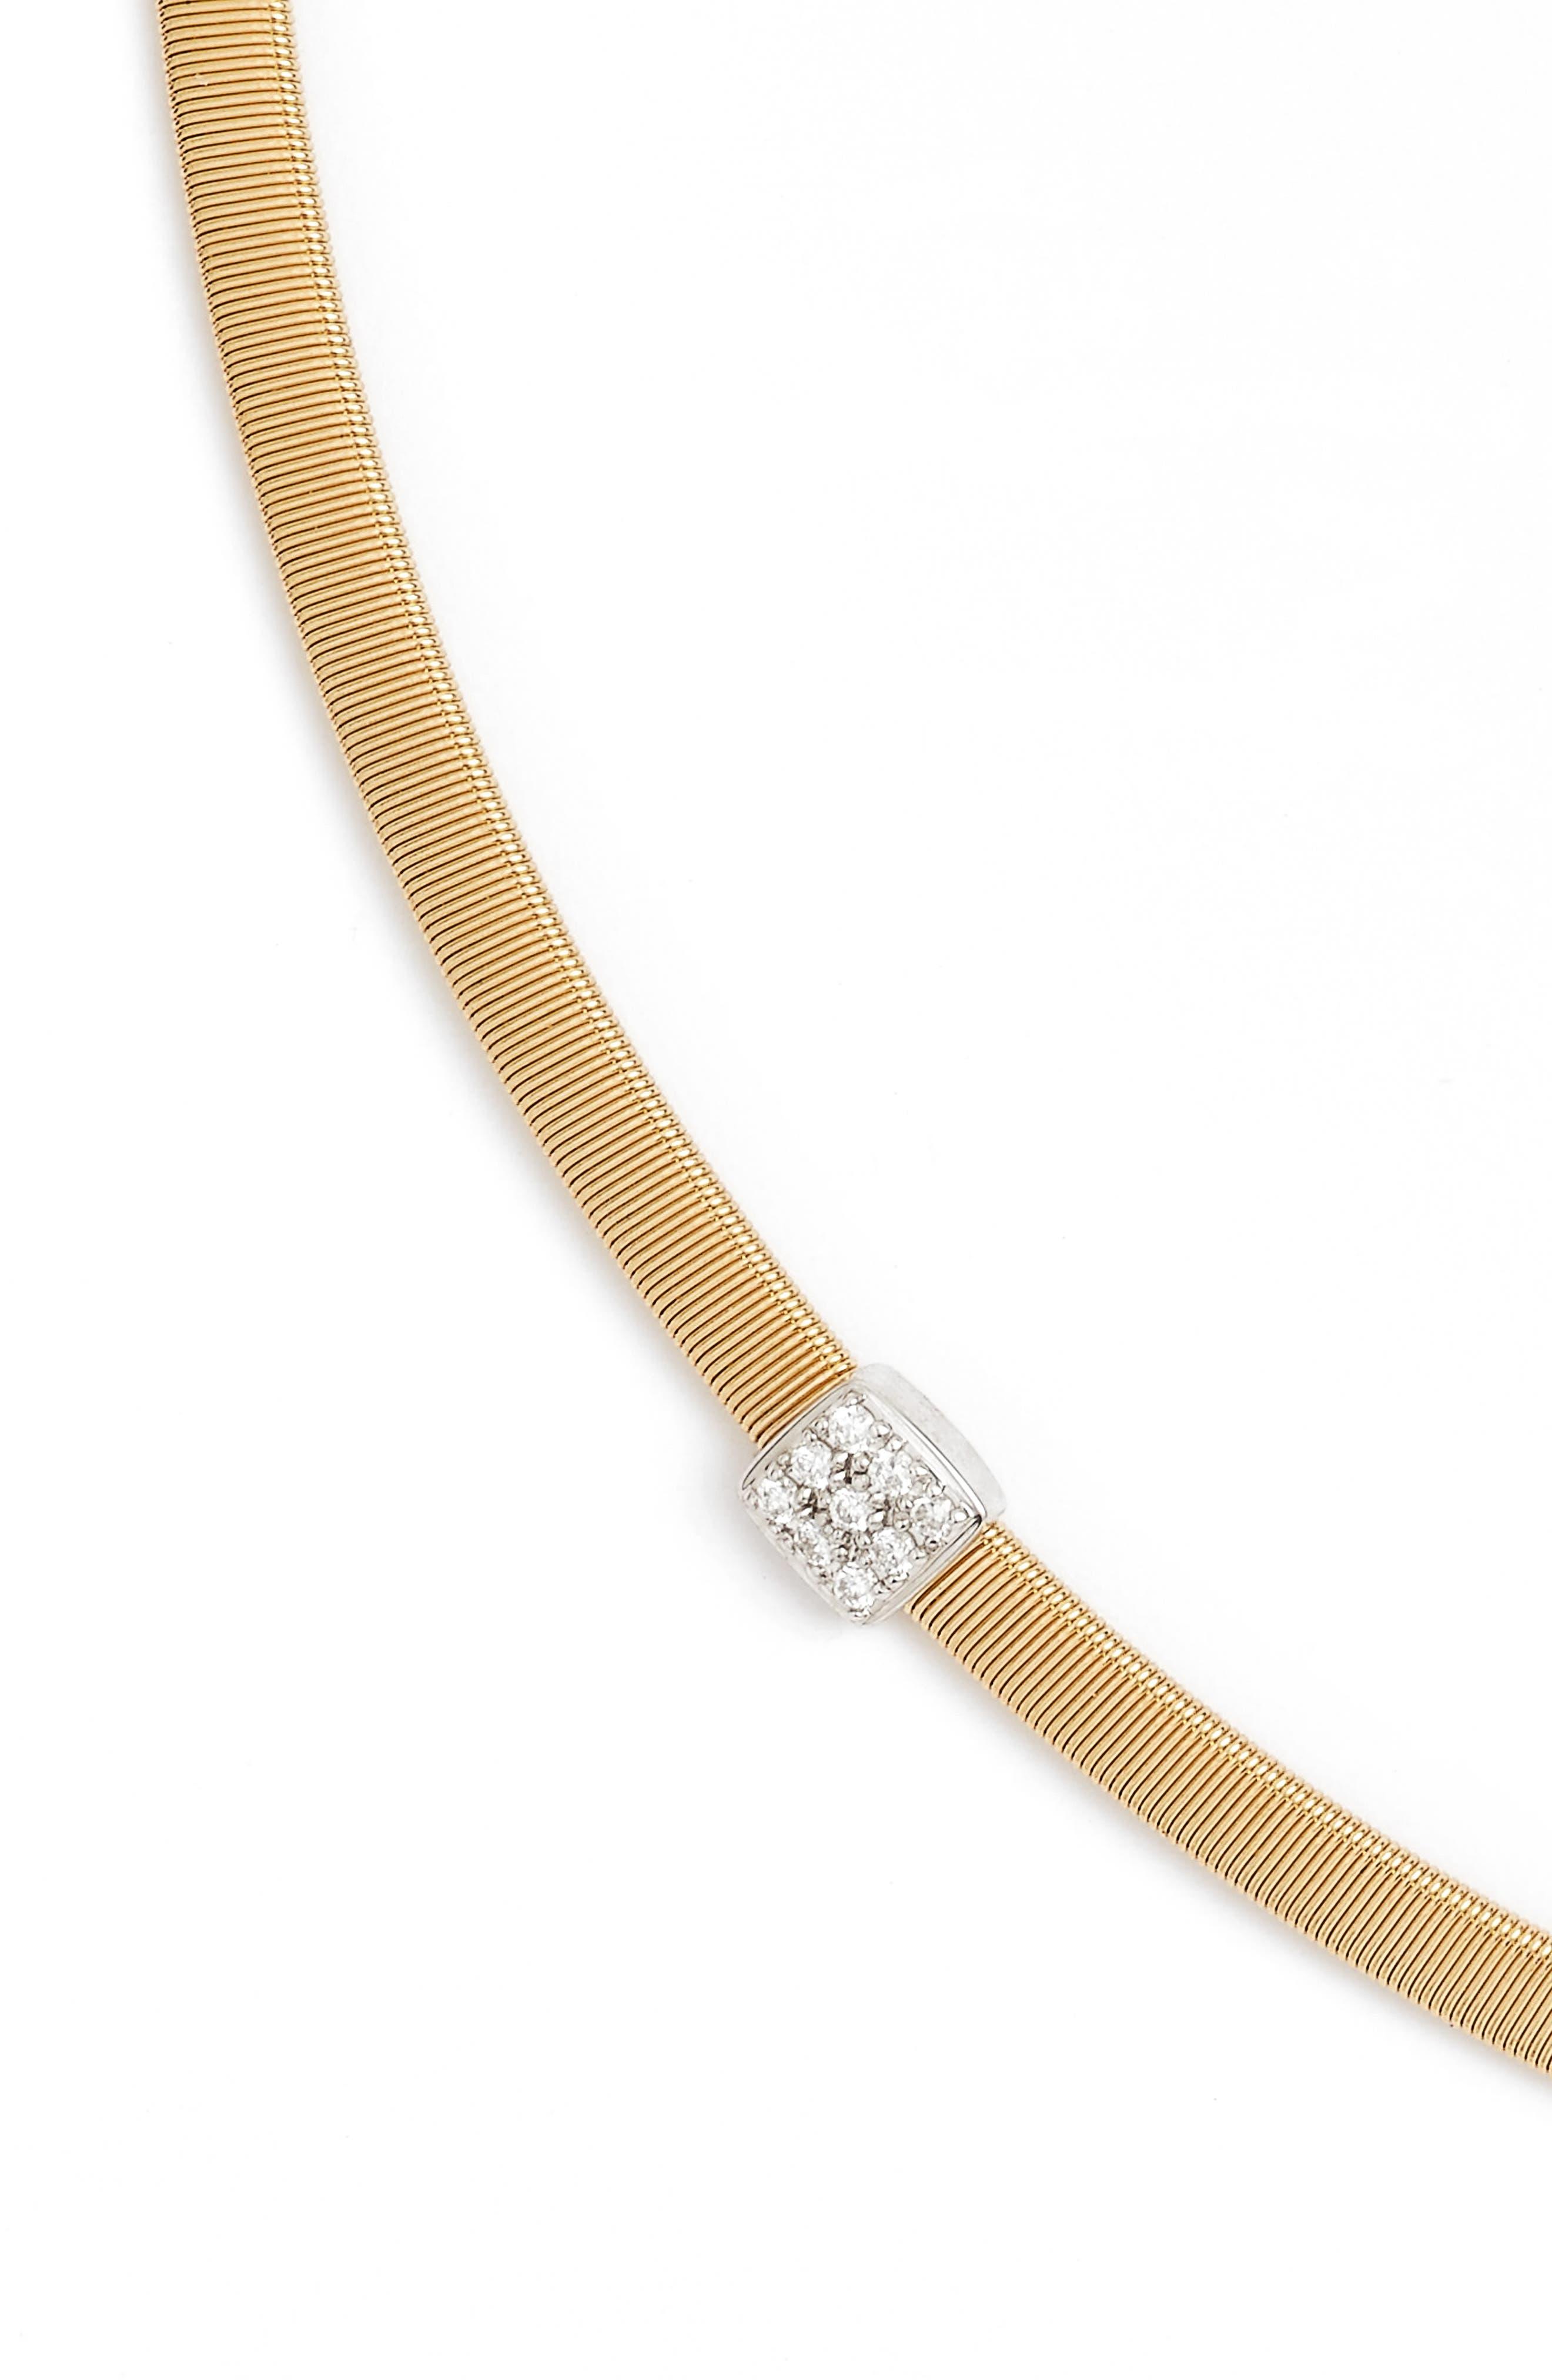 Masai Diamond Collar Necklace,                             Alternate thumbnail 3, color,                             YELLOW GOLD